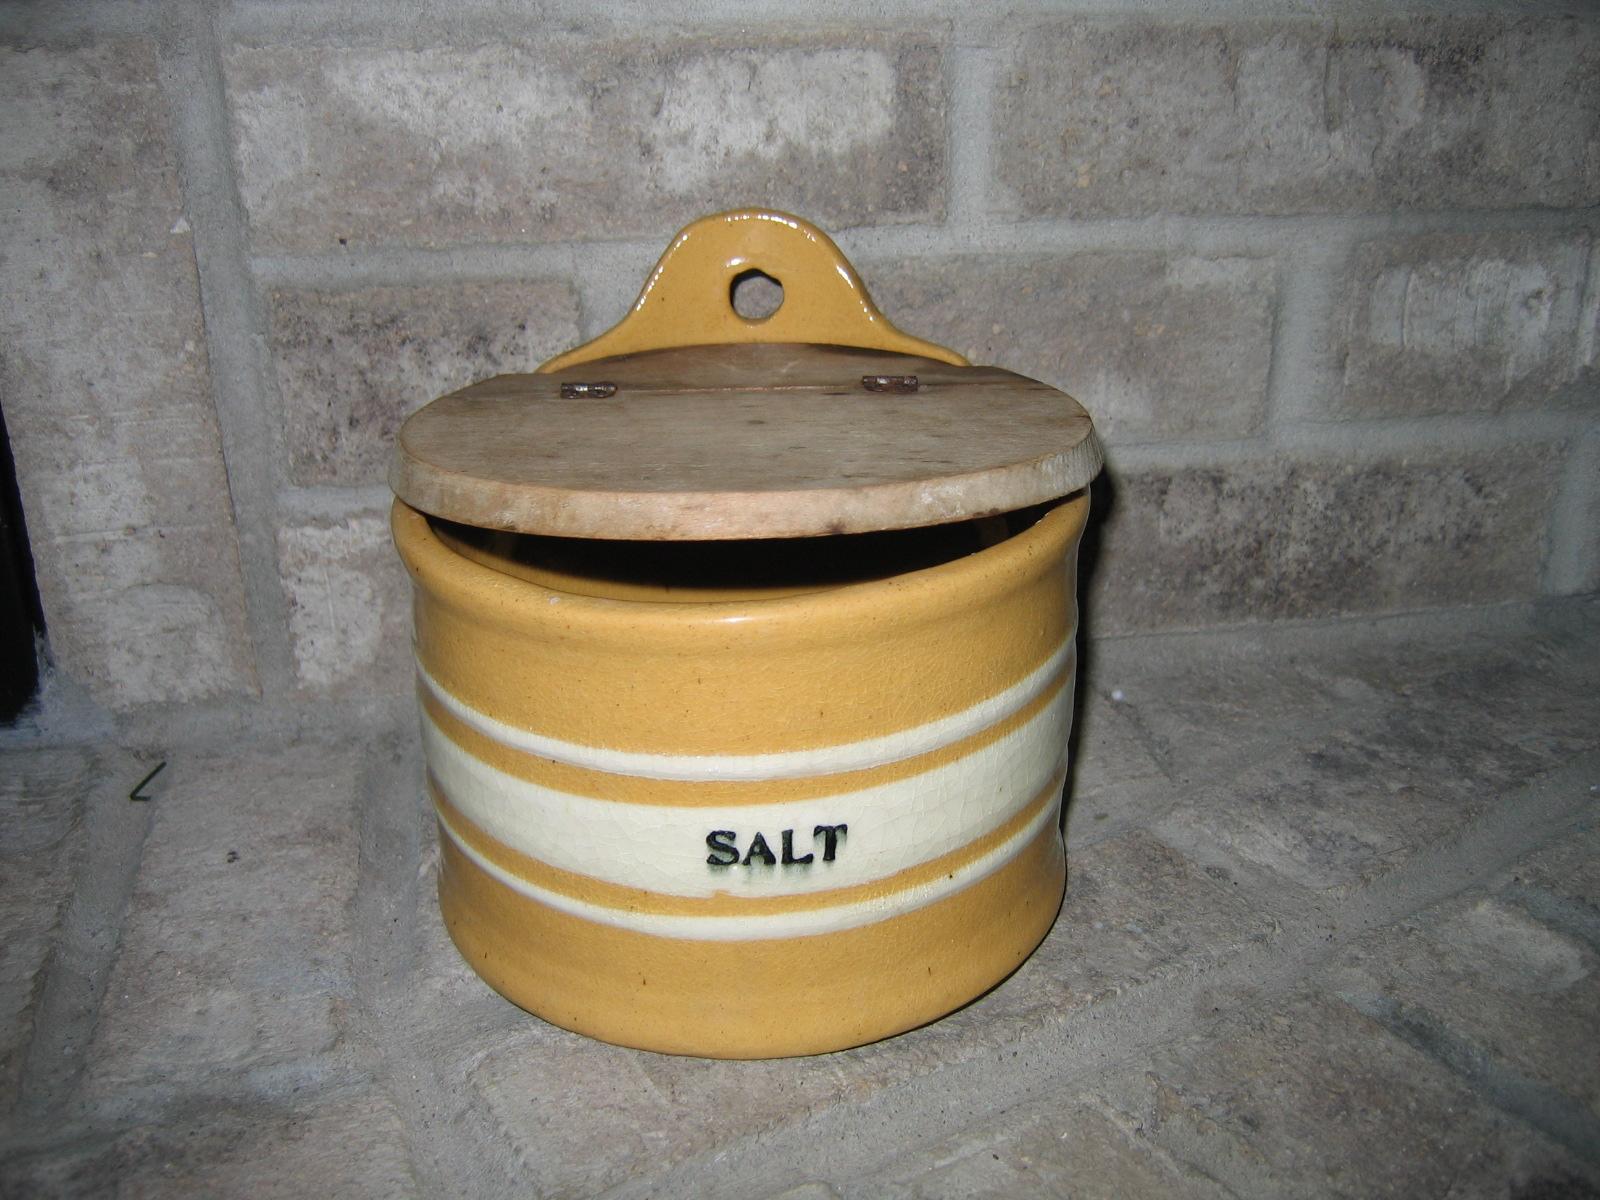 Antique Vintage Wall Hanging Salt Stoneware Pottery Cellar Box item #617 - For Sale & Antique Vintage Wall Hanging Salt Stoneware Pottery Cellar Box item ...